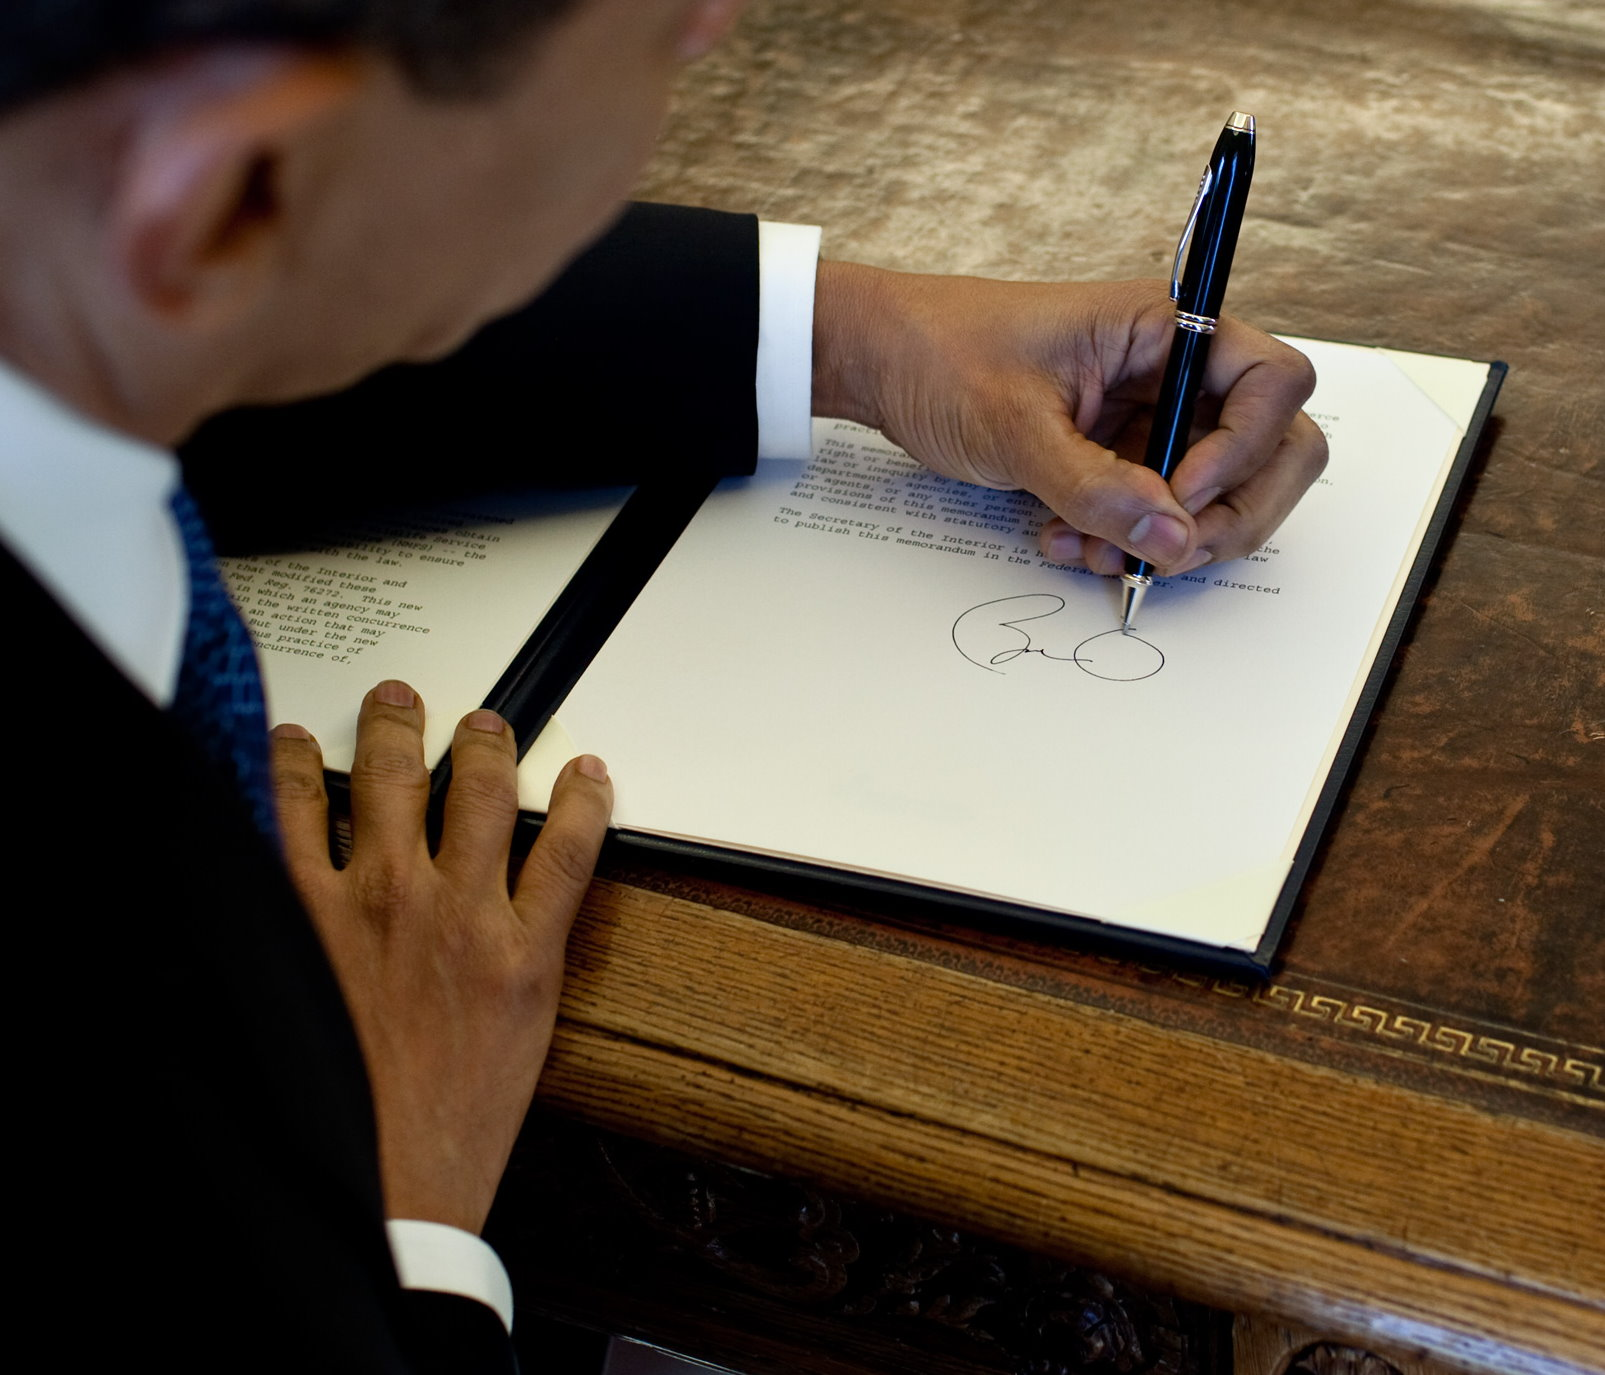 President Barack Obama signing with left hand